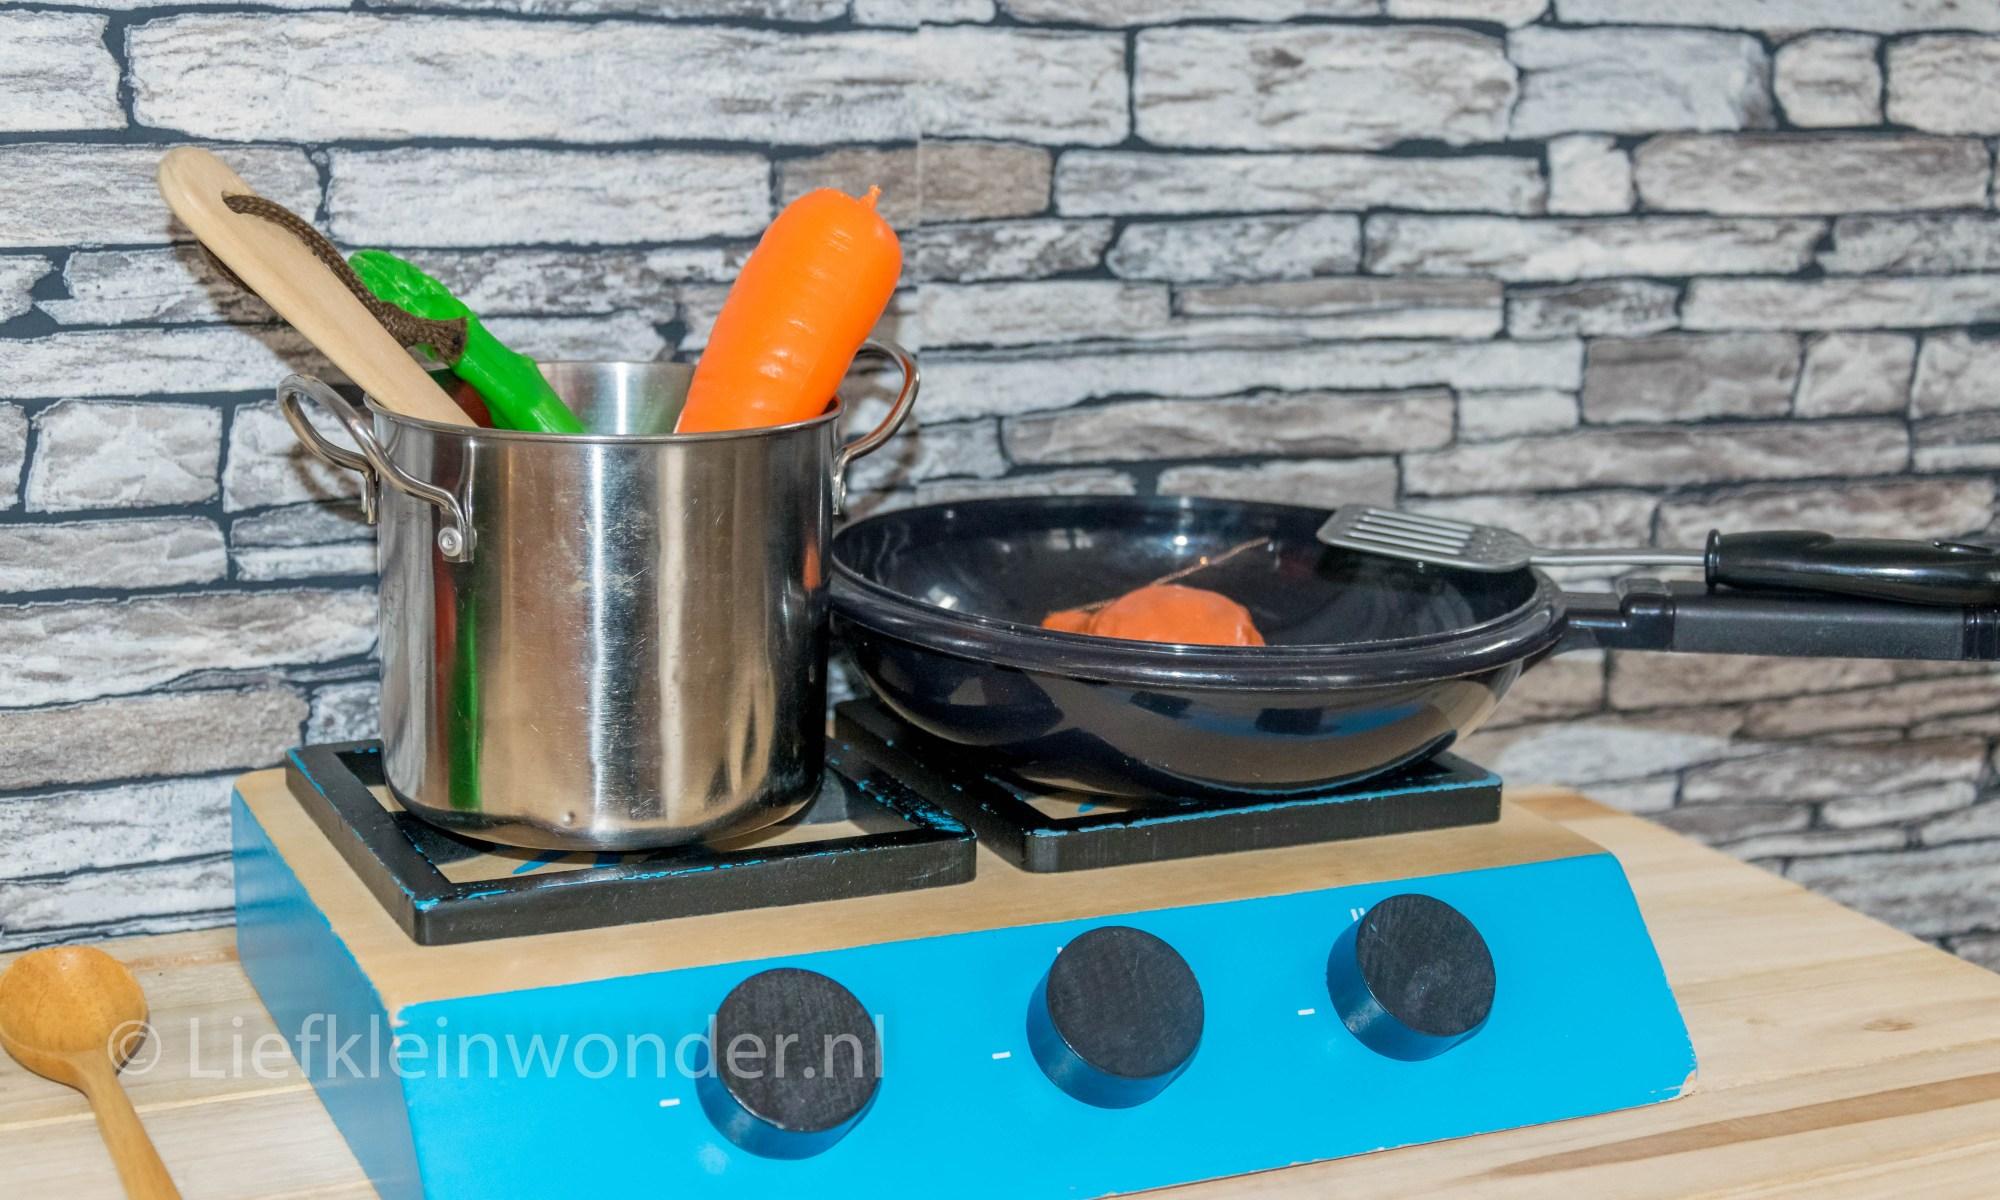 Speelgoed fruit groente houten speelgoed fornuis